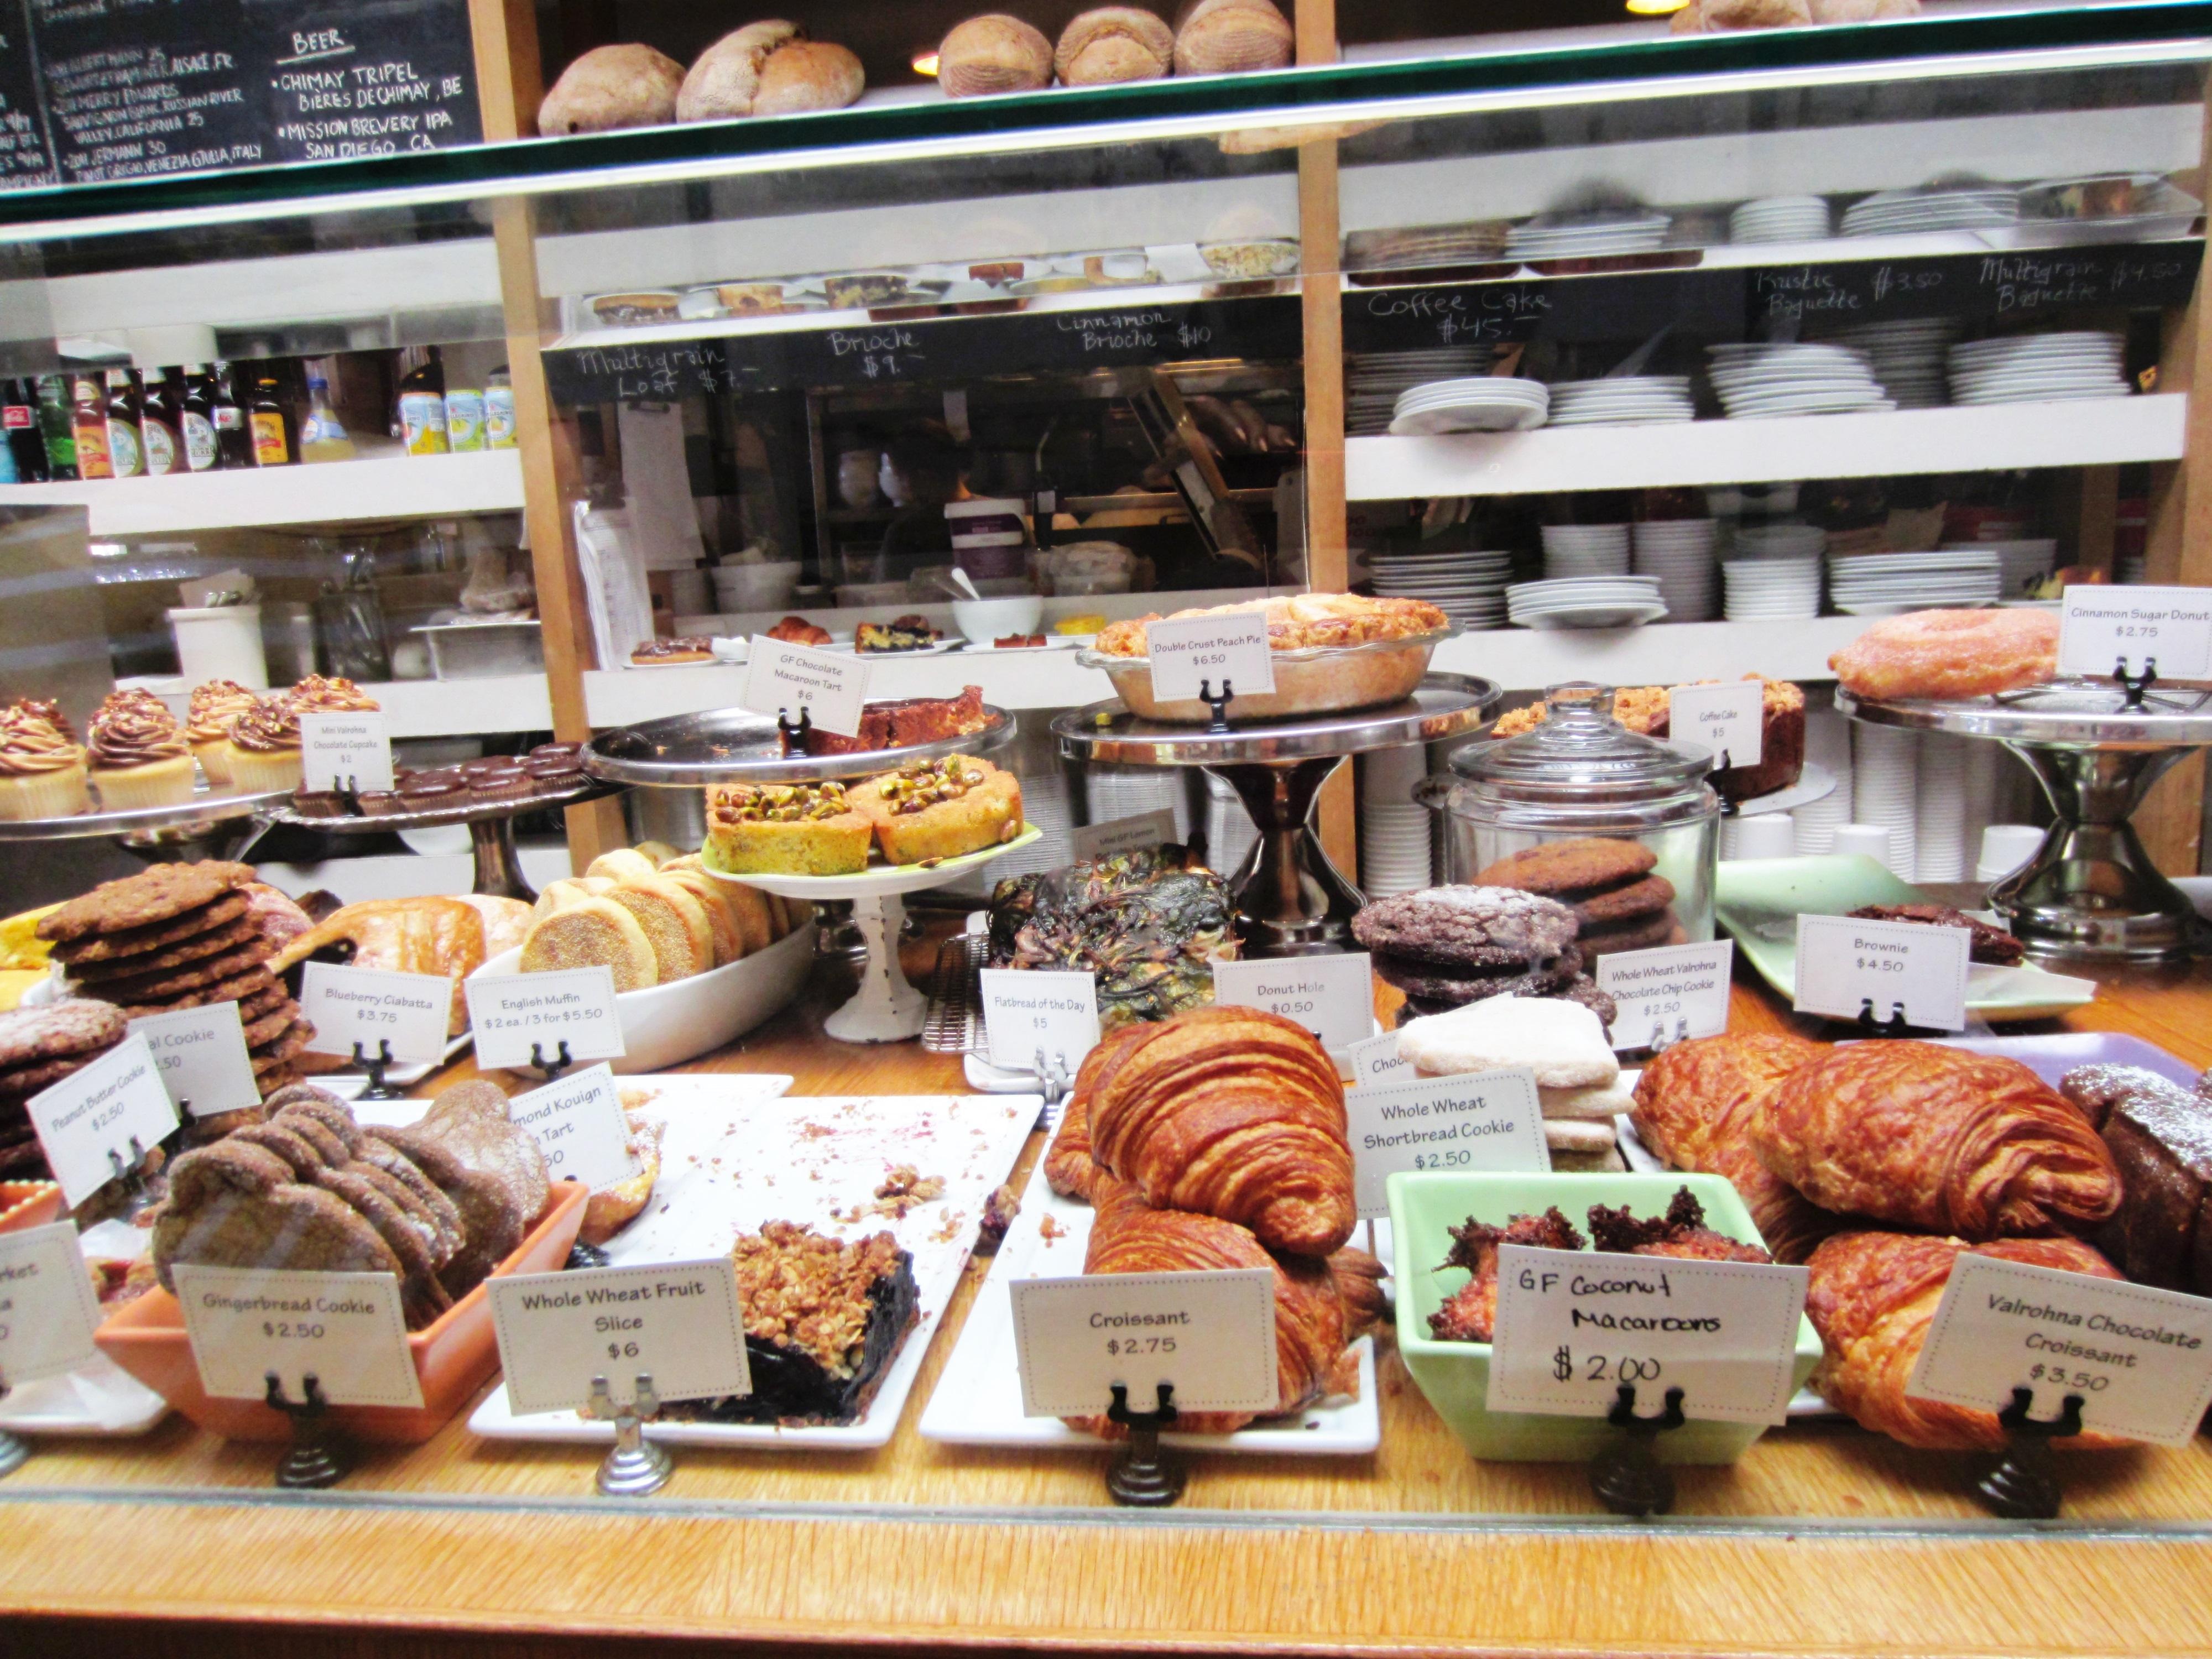 Huckleberry Bakery Cafe Blueberry Cornmeal Cake